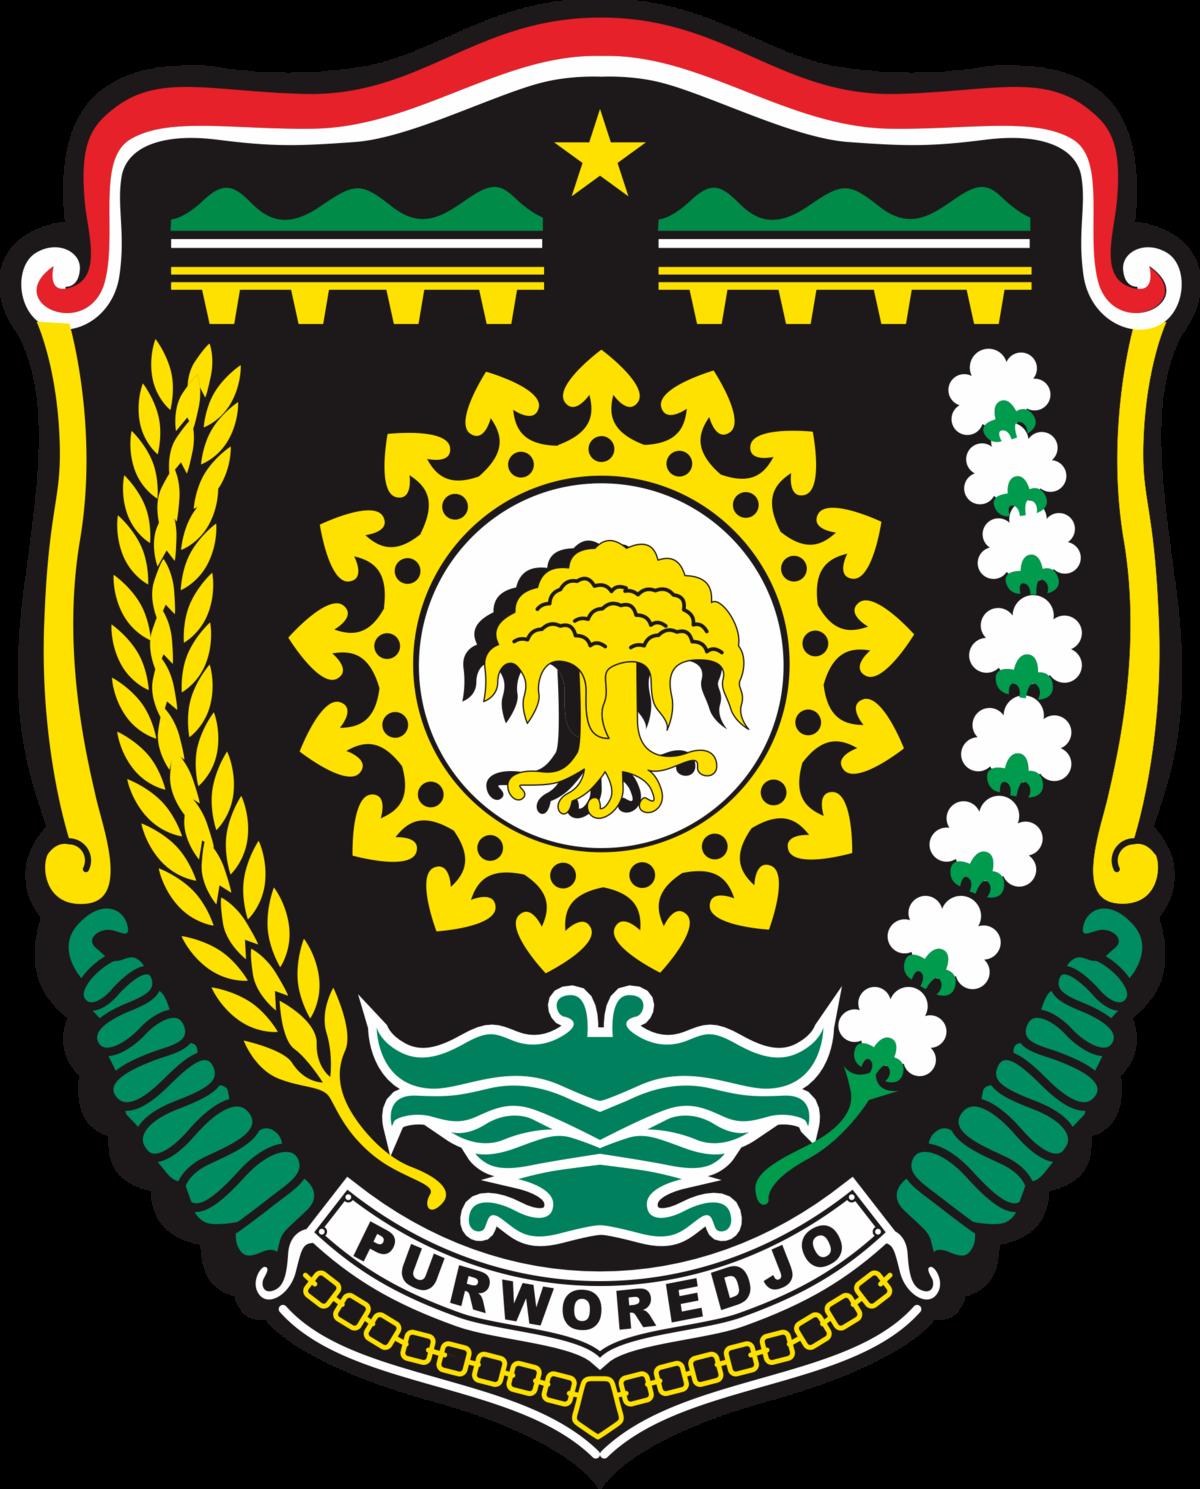 Kabupaten Purworejo Wikipedia Bahasa Indonesia Ensiklopedia Bebas Pantai Pasir Puncu